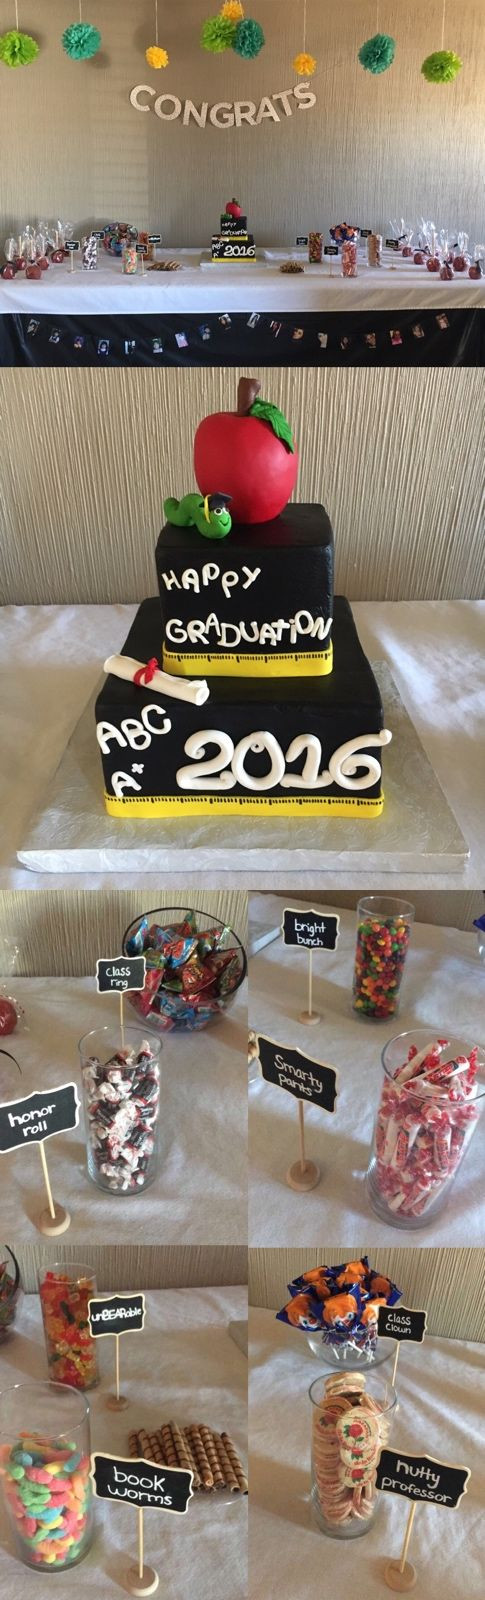 Graduation Party Desserts  Best 25 Dessert puns ideas on Pinterest